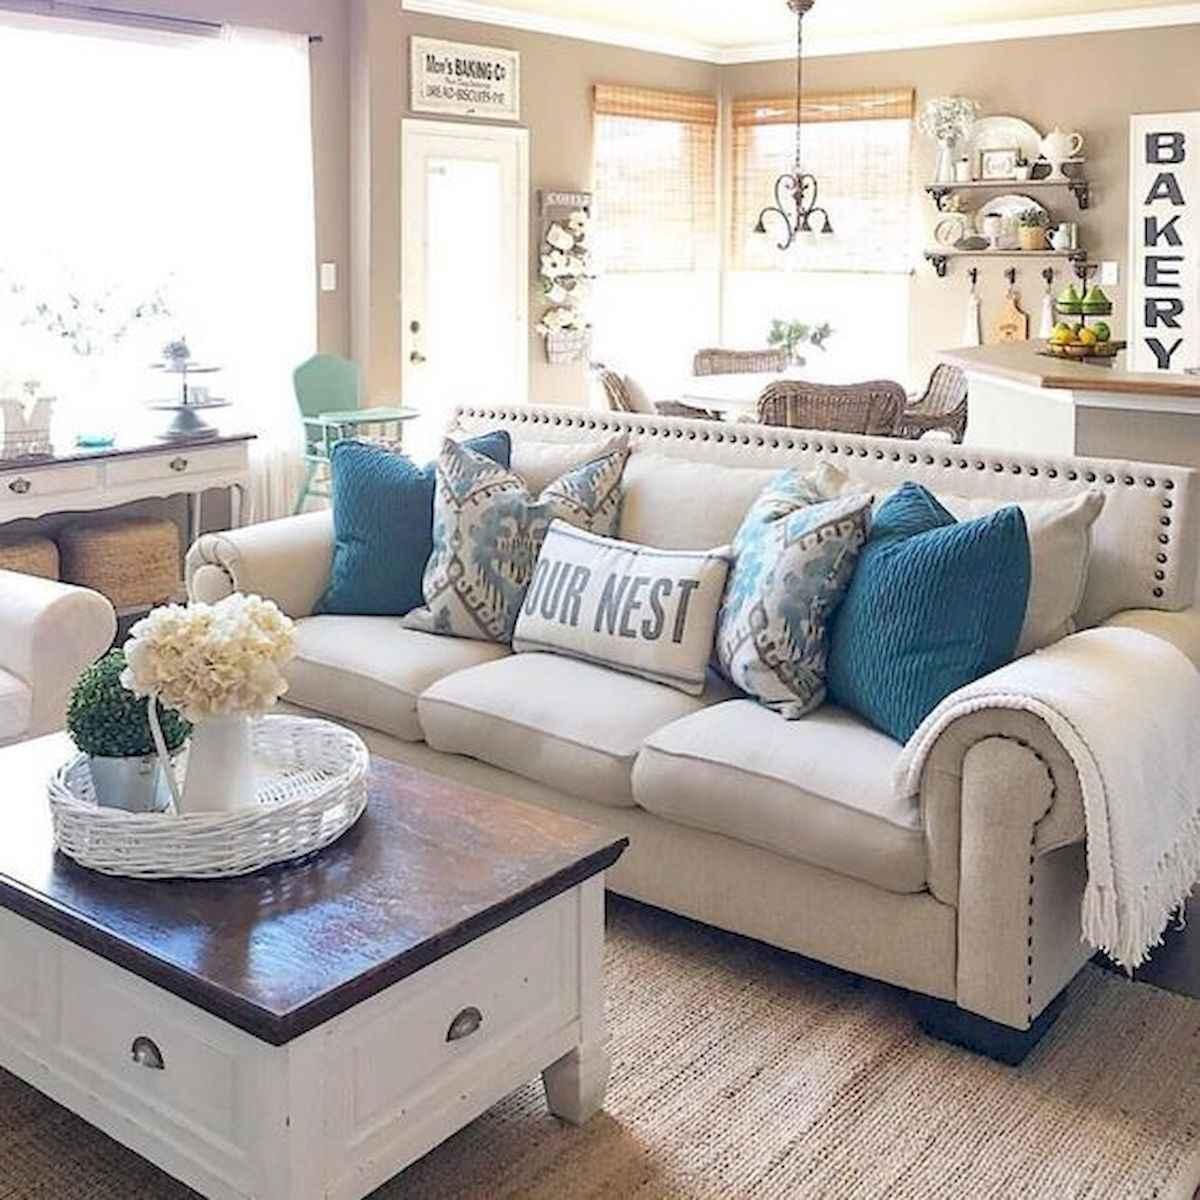 80 Elegant Furniture For Modern Farmhouse Living Room Decor Ideas (30)